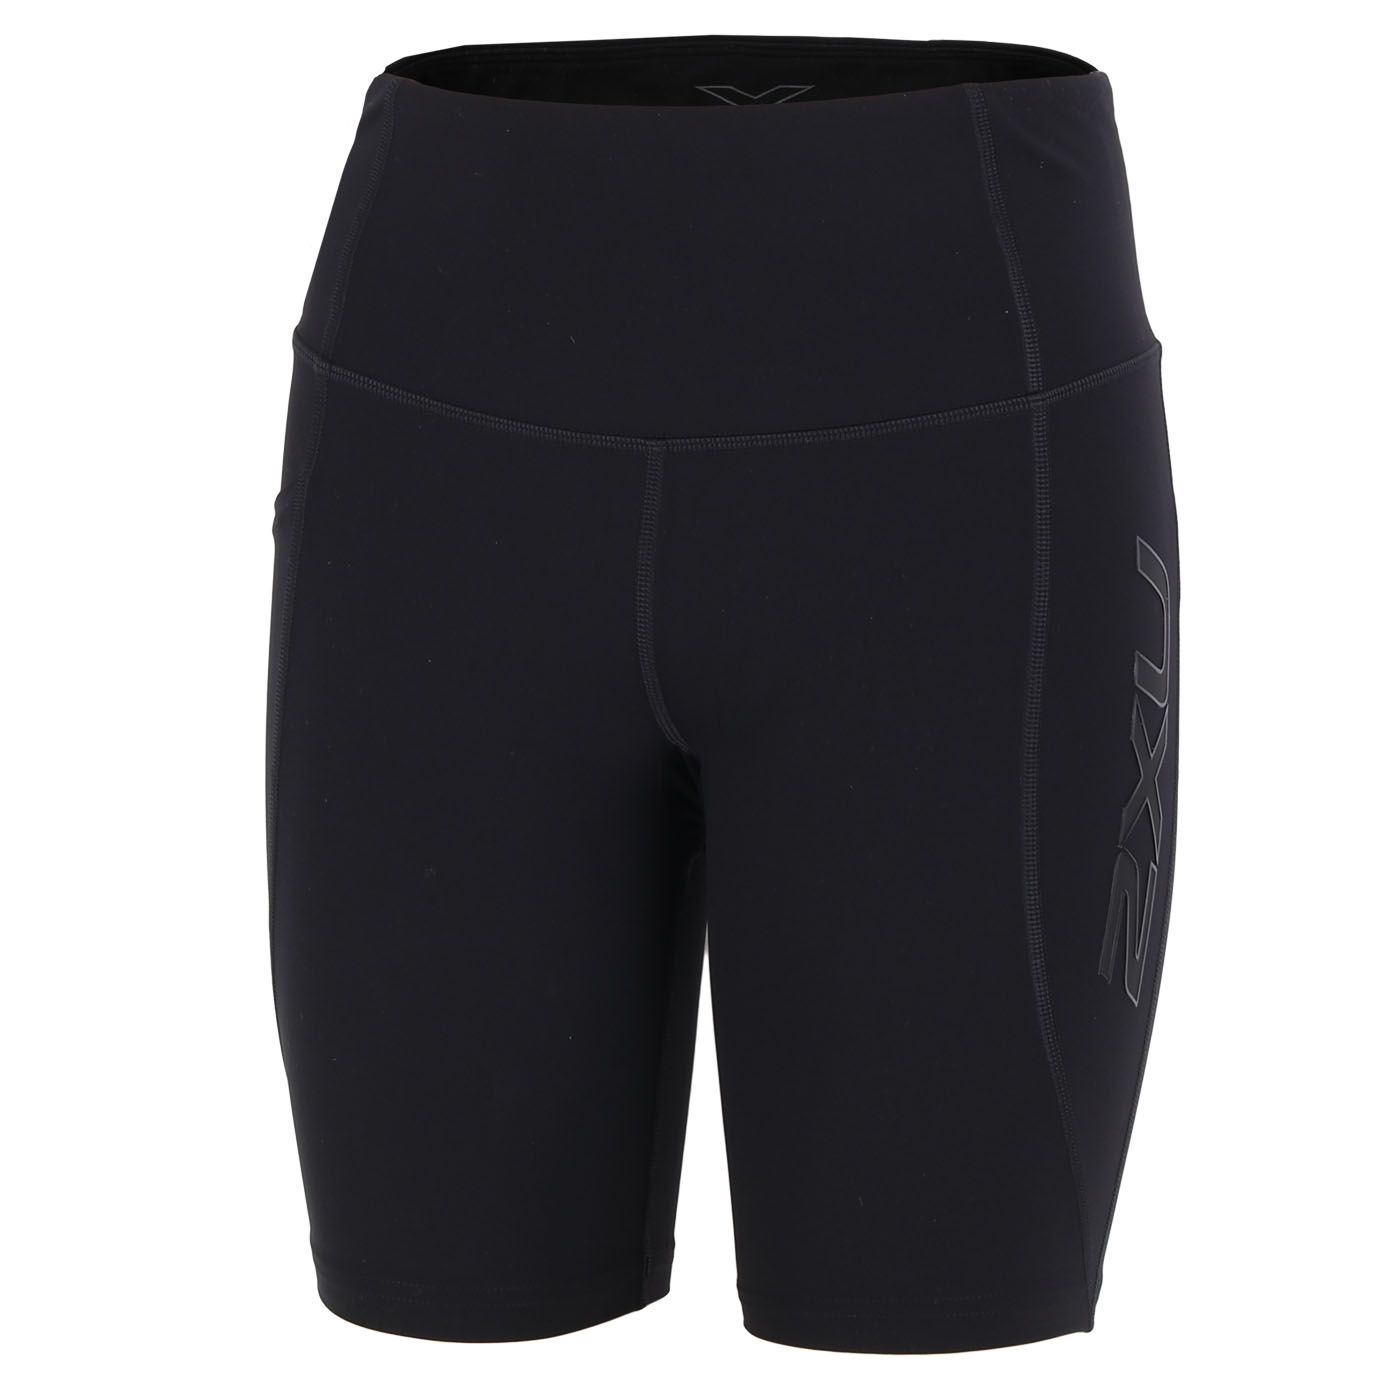 Imagen de 2XU Fitness New Heights Bike Pantalon corto para mujer - black/black